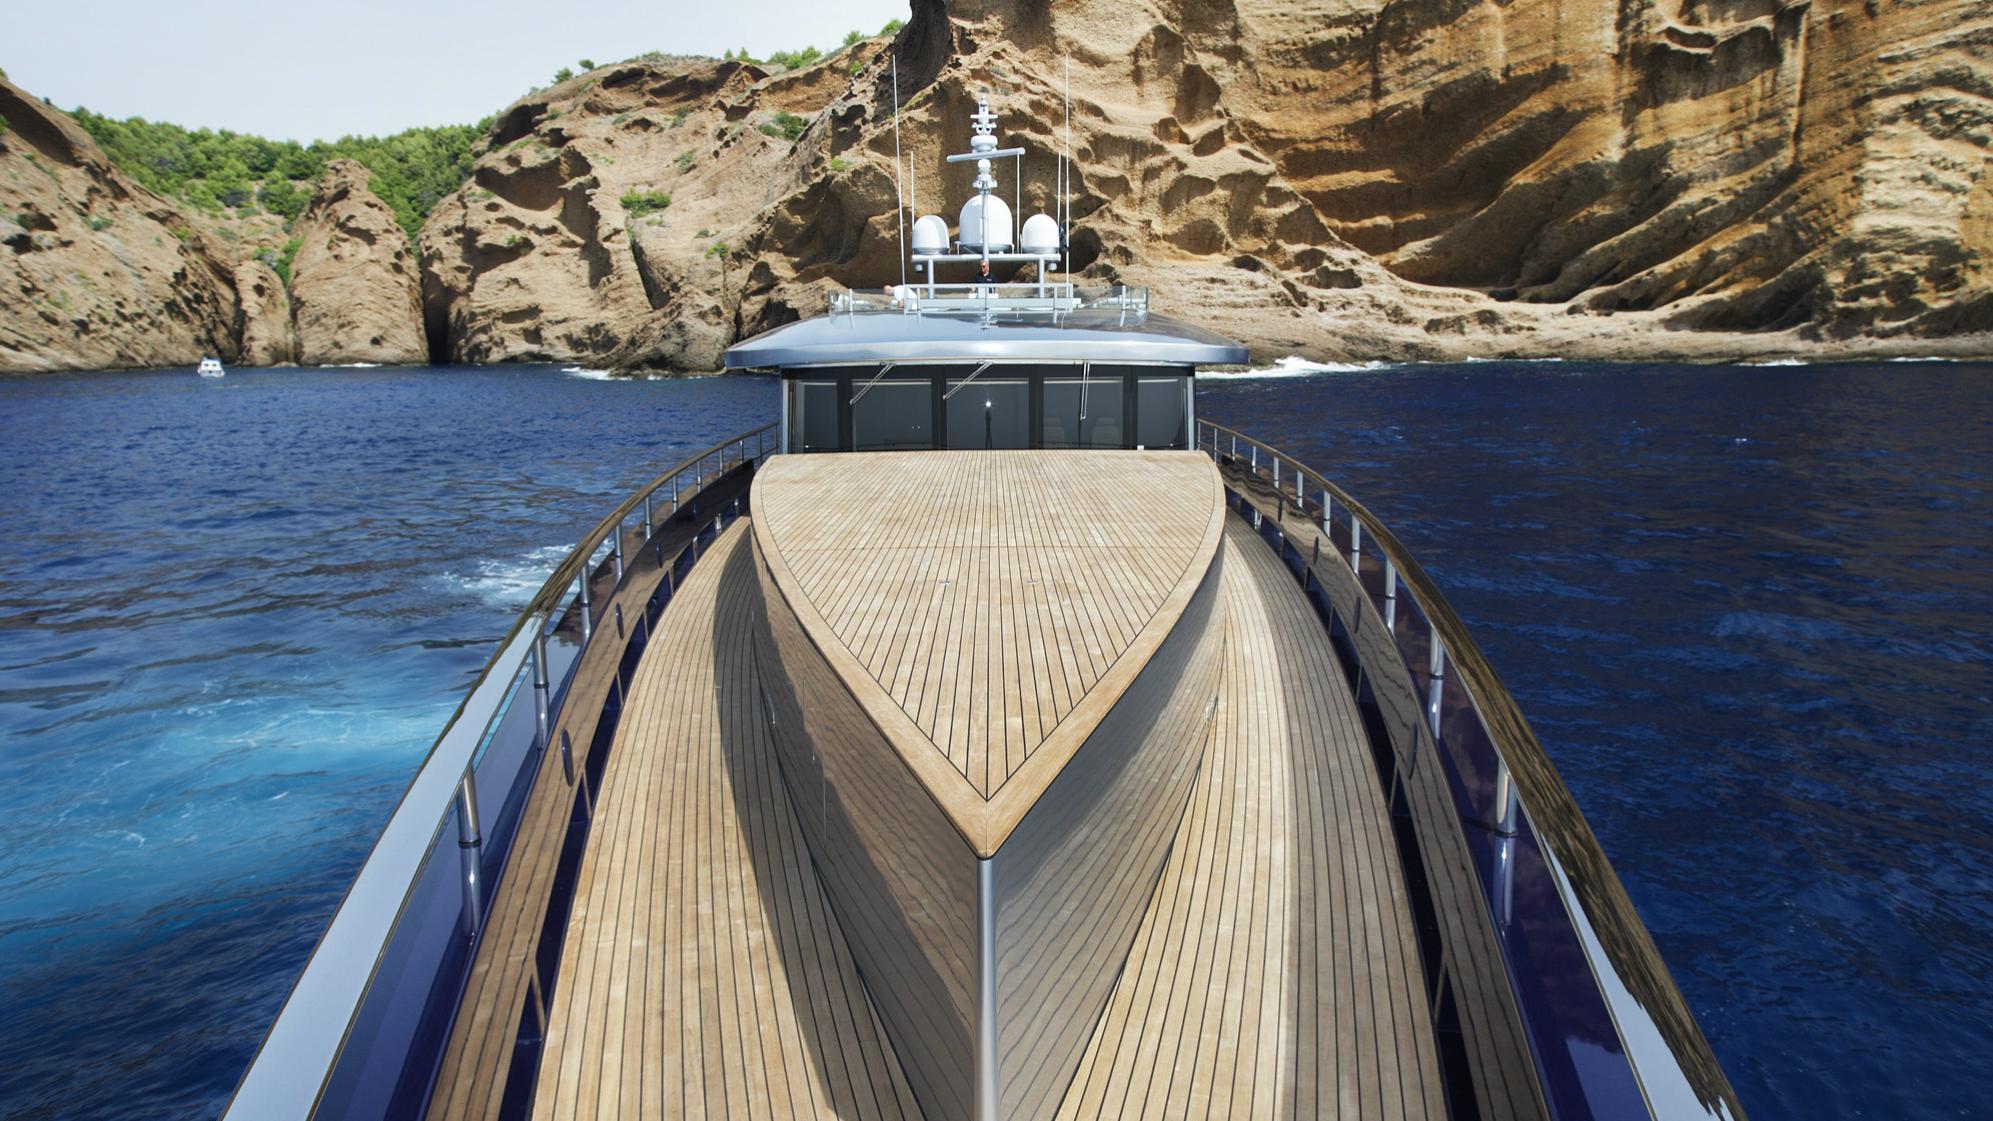 blade-motor-yacht-mmgi-2010-44m-deck